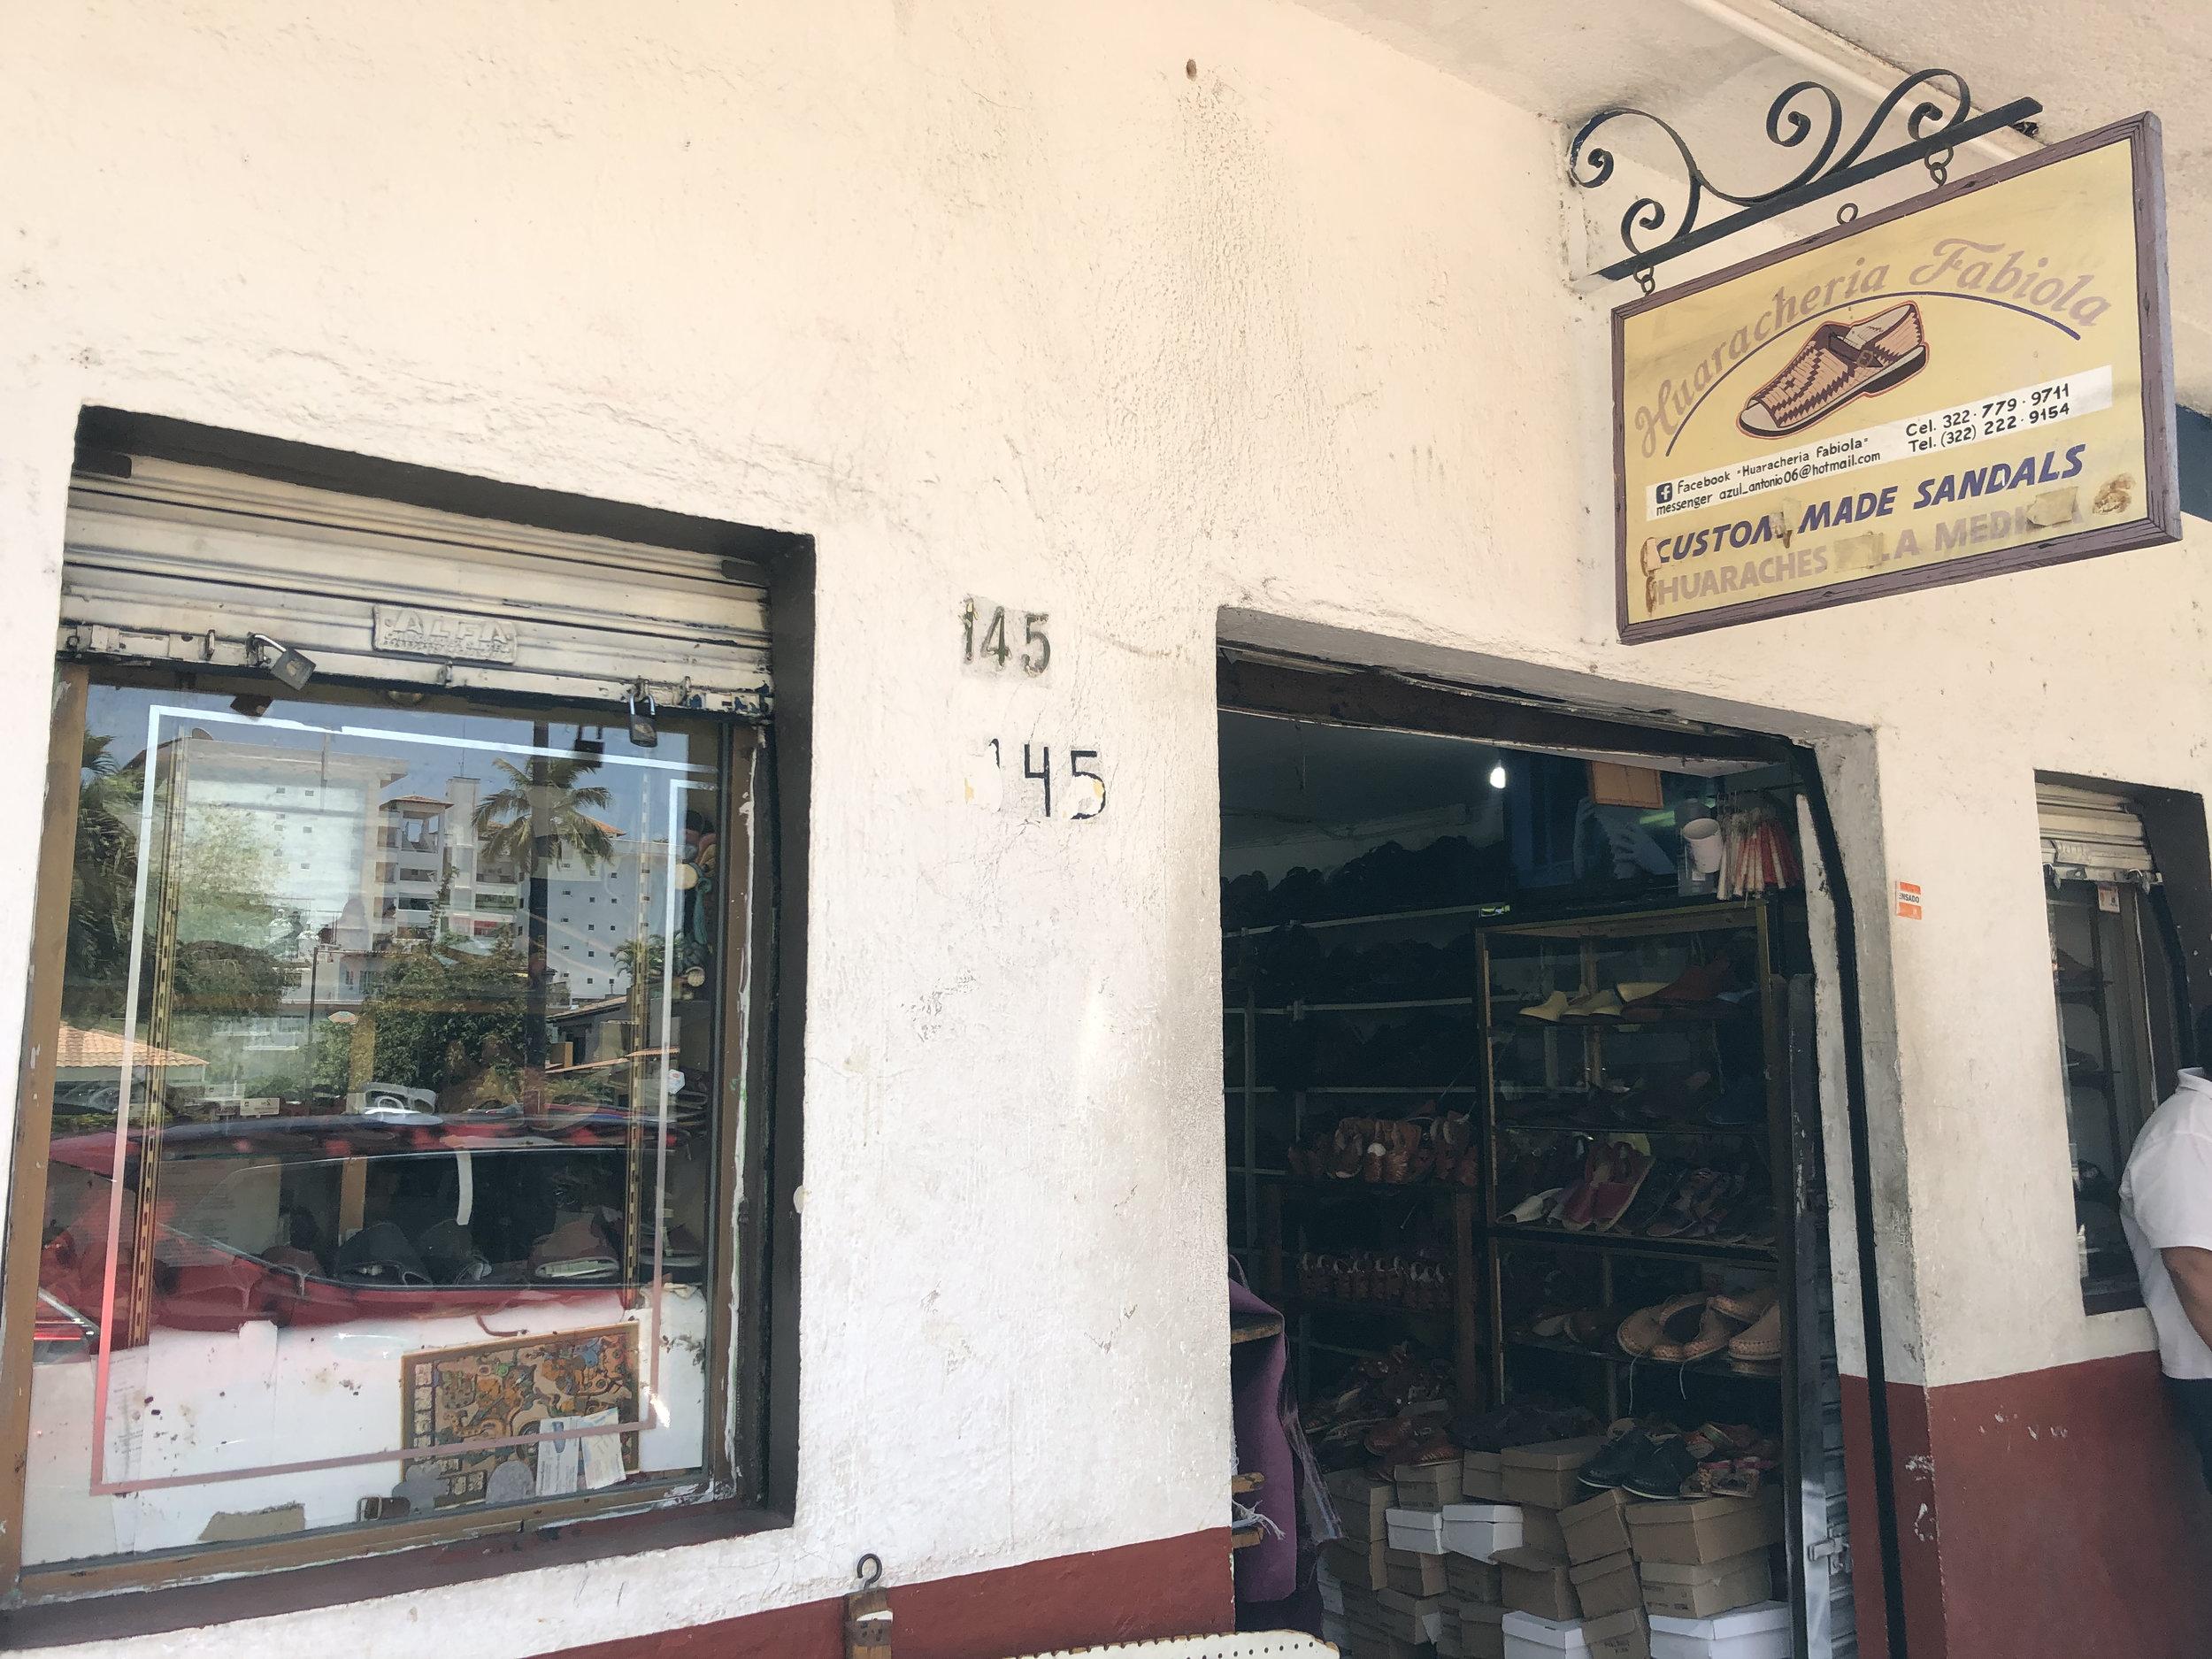 Photo: Exterior Huaracheria Fabiola